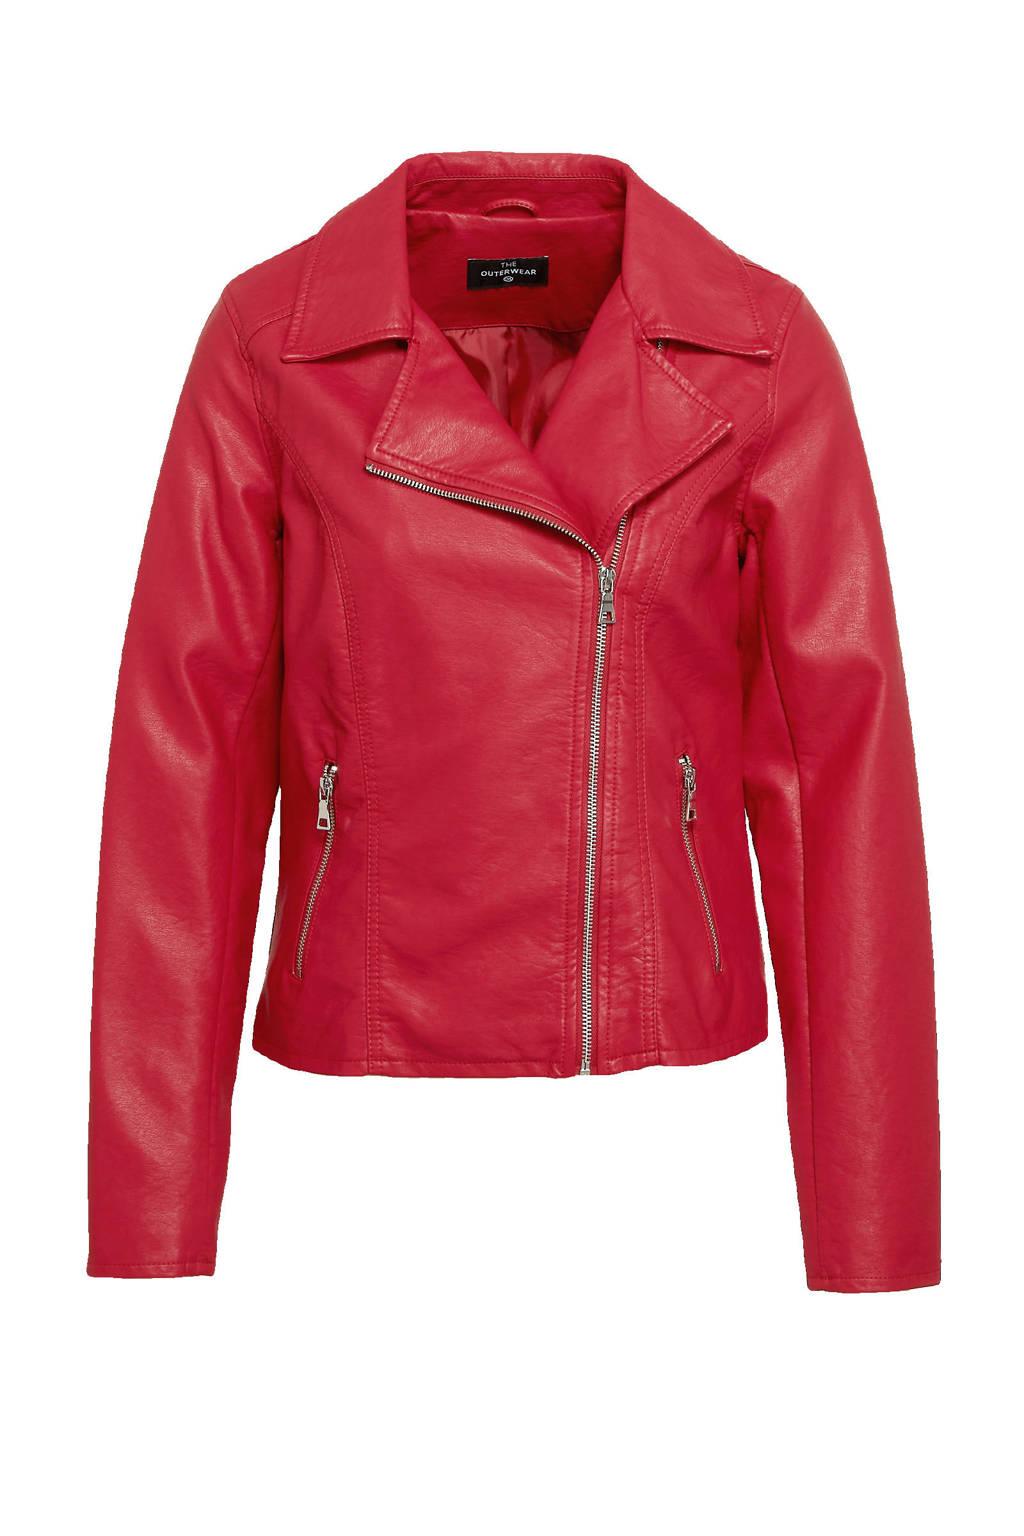 C&A The Outerwear imitatieleren bikerjack rood, Rood